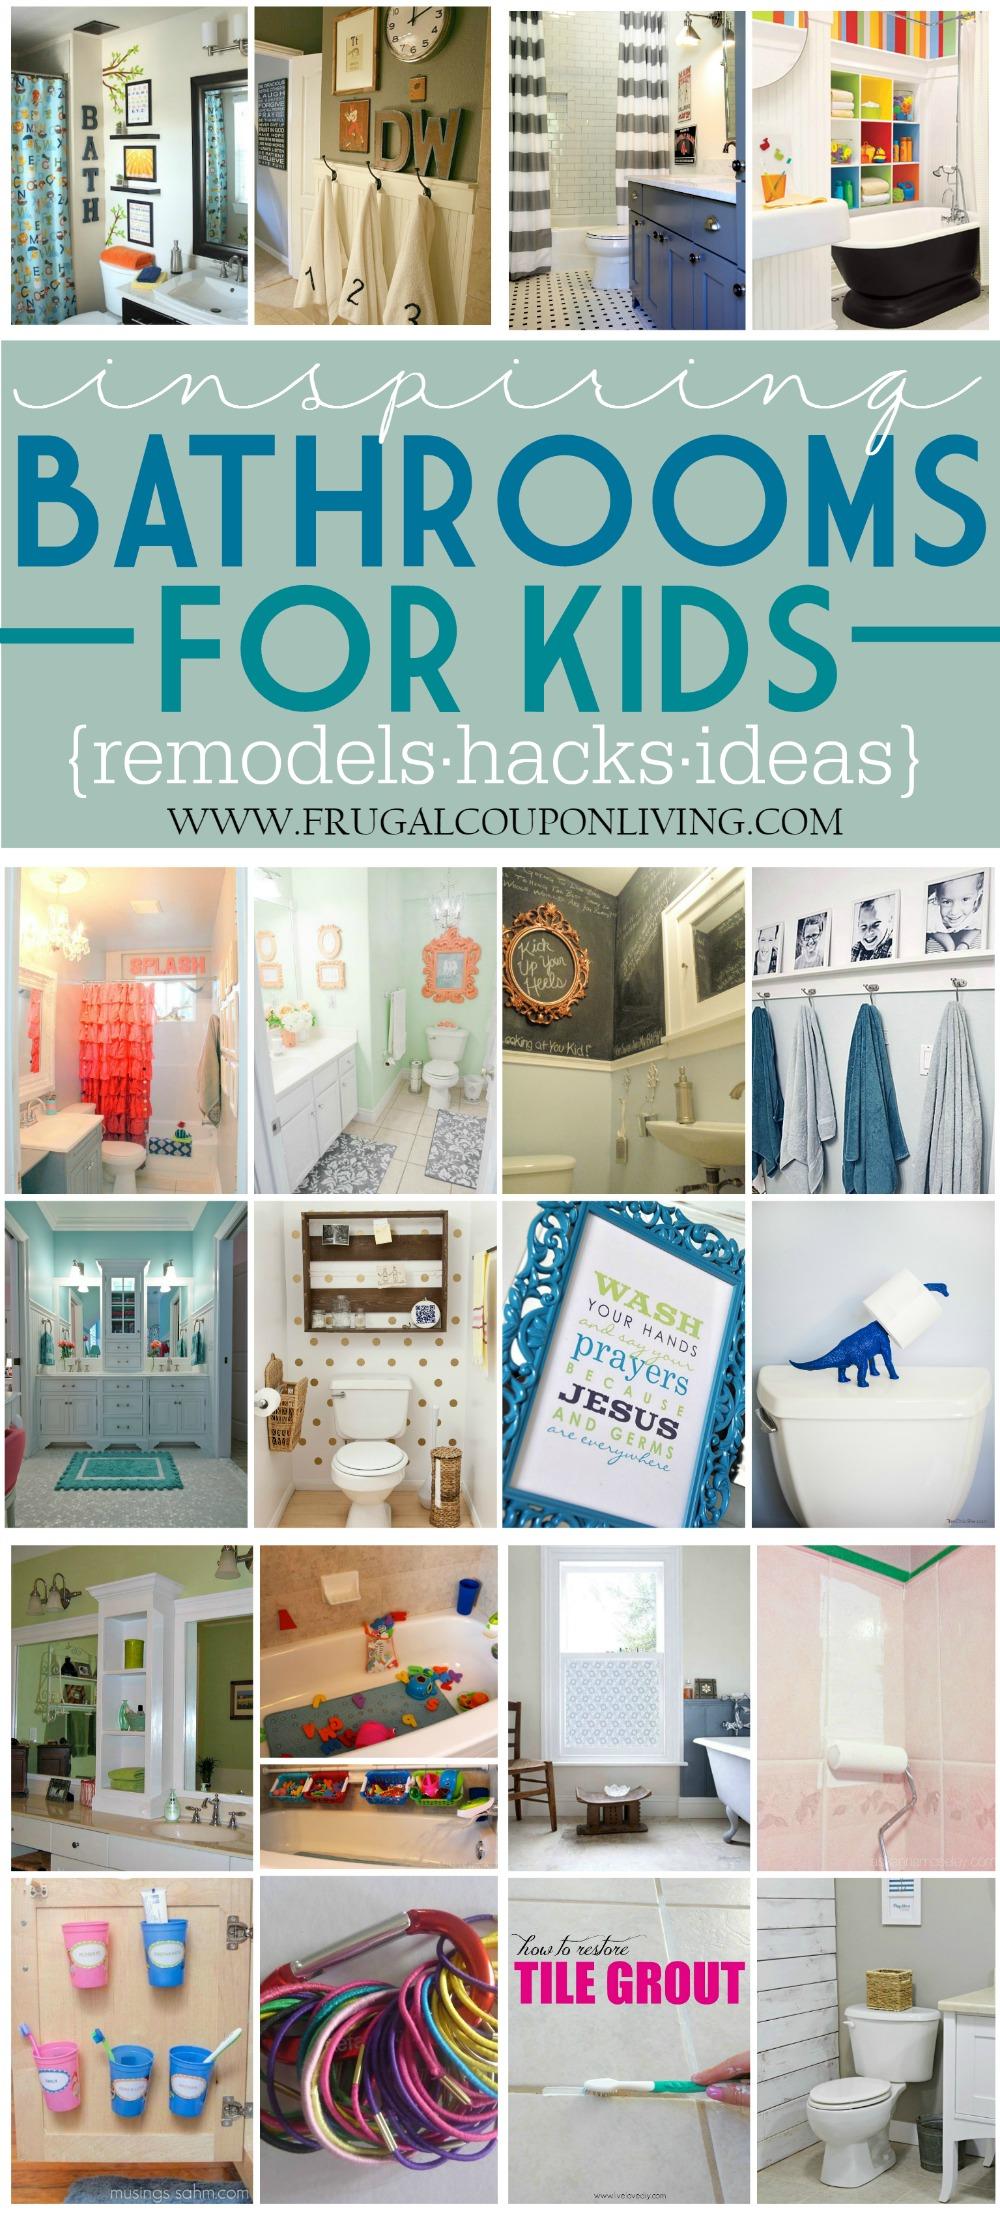 Inspiring Kids Bathrooms Remodels and Hacks